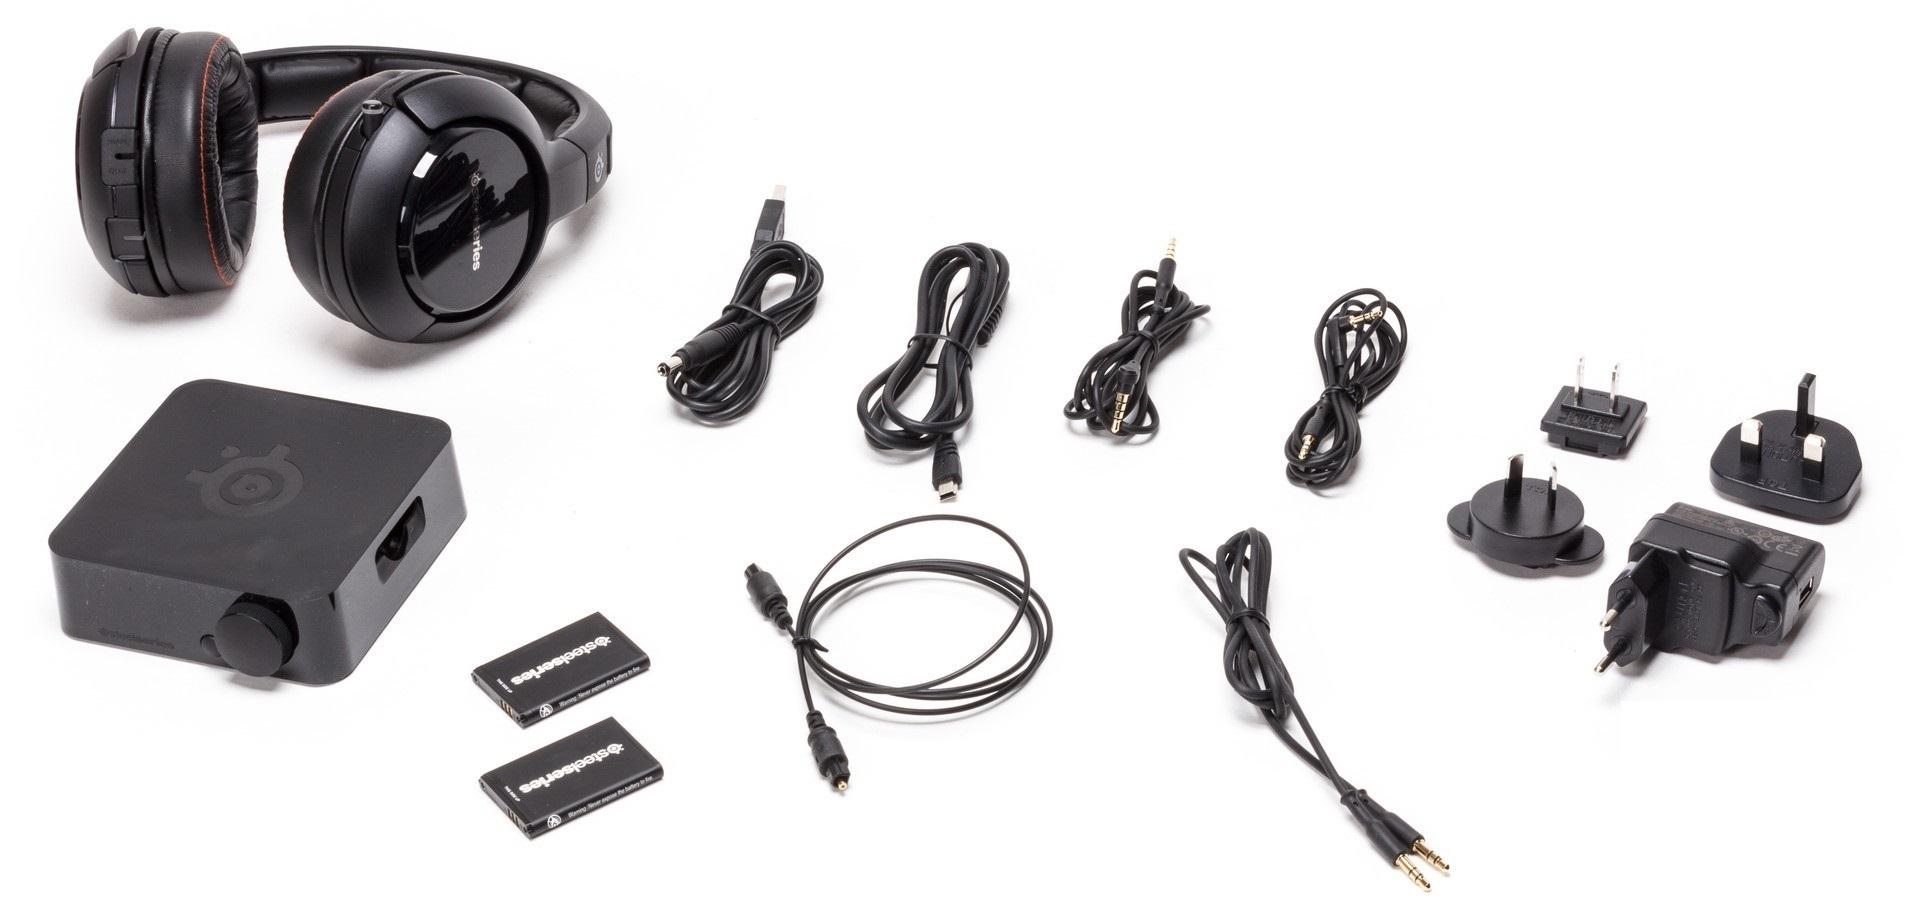 Steelseries H Wireless Headset Dolby 7 1 Surround Sound